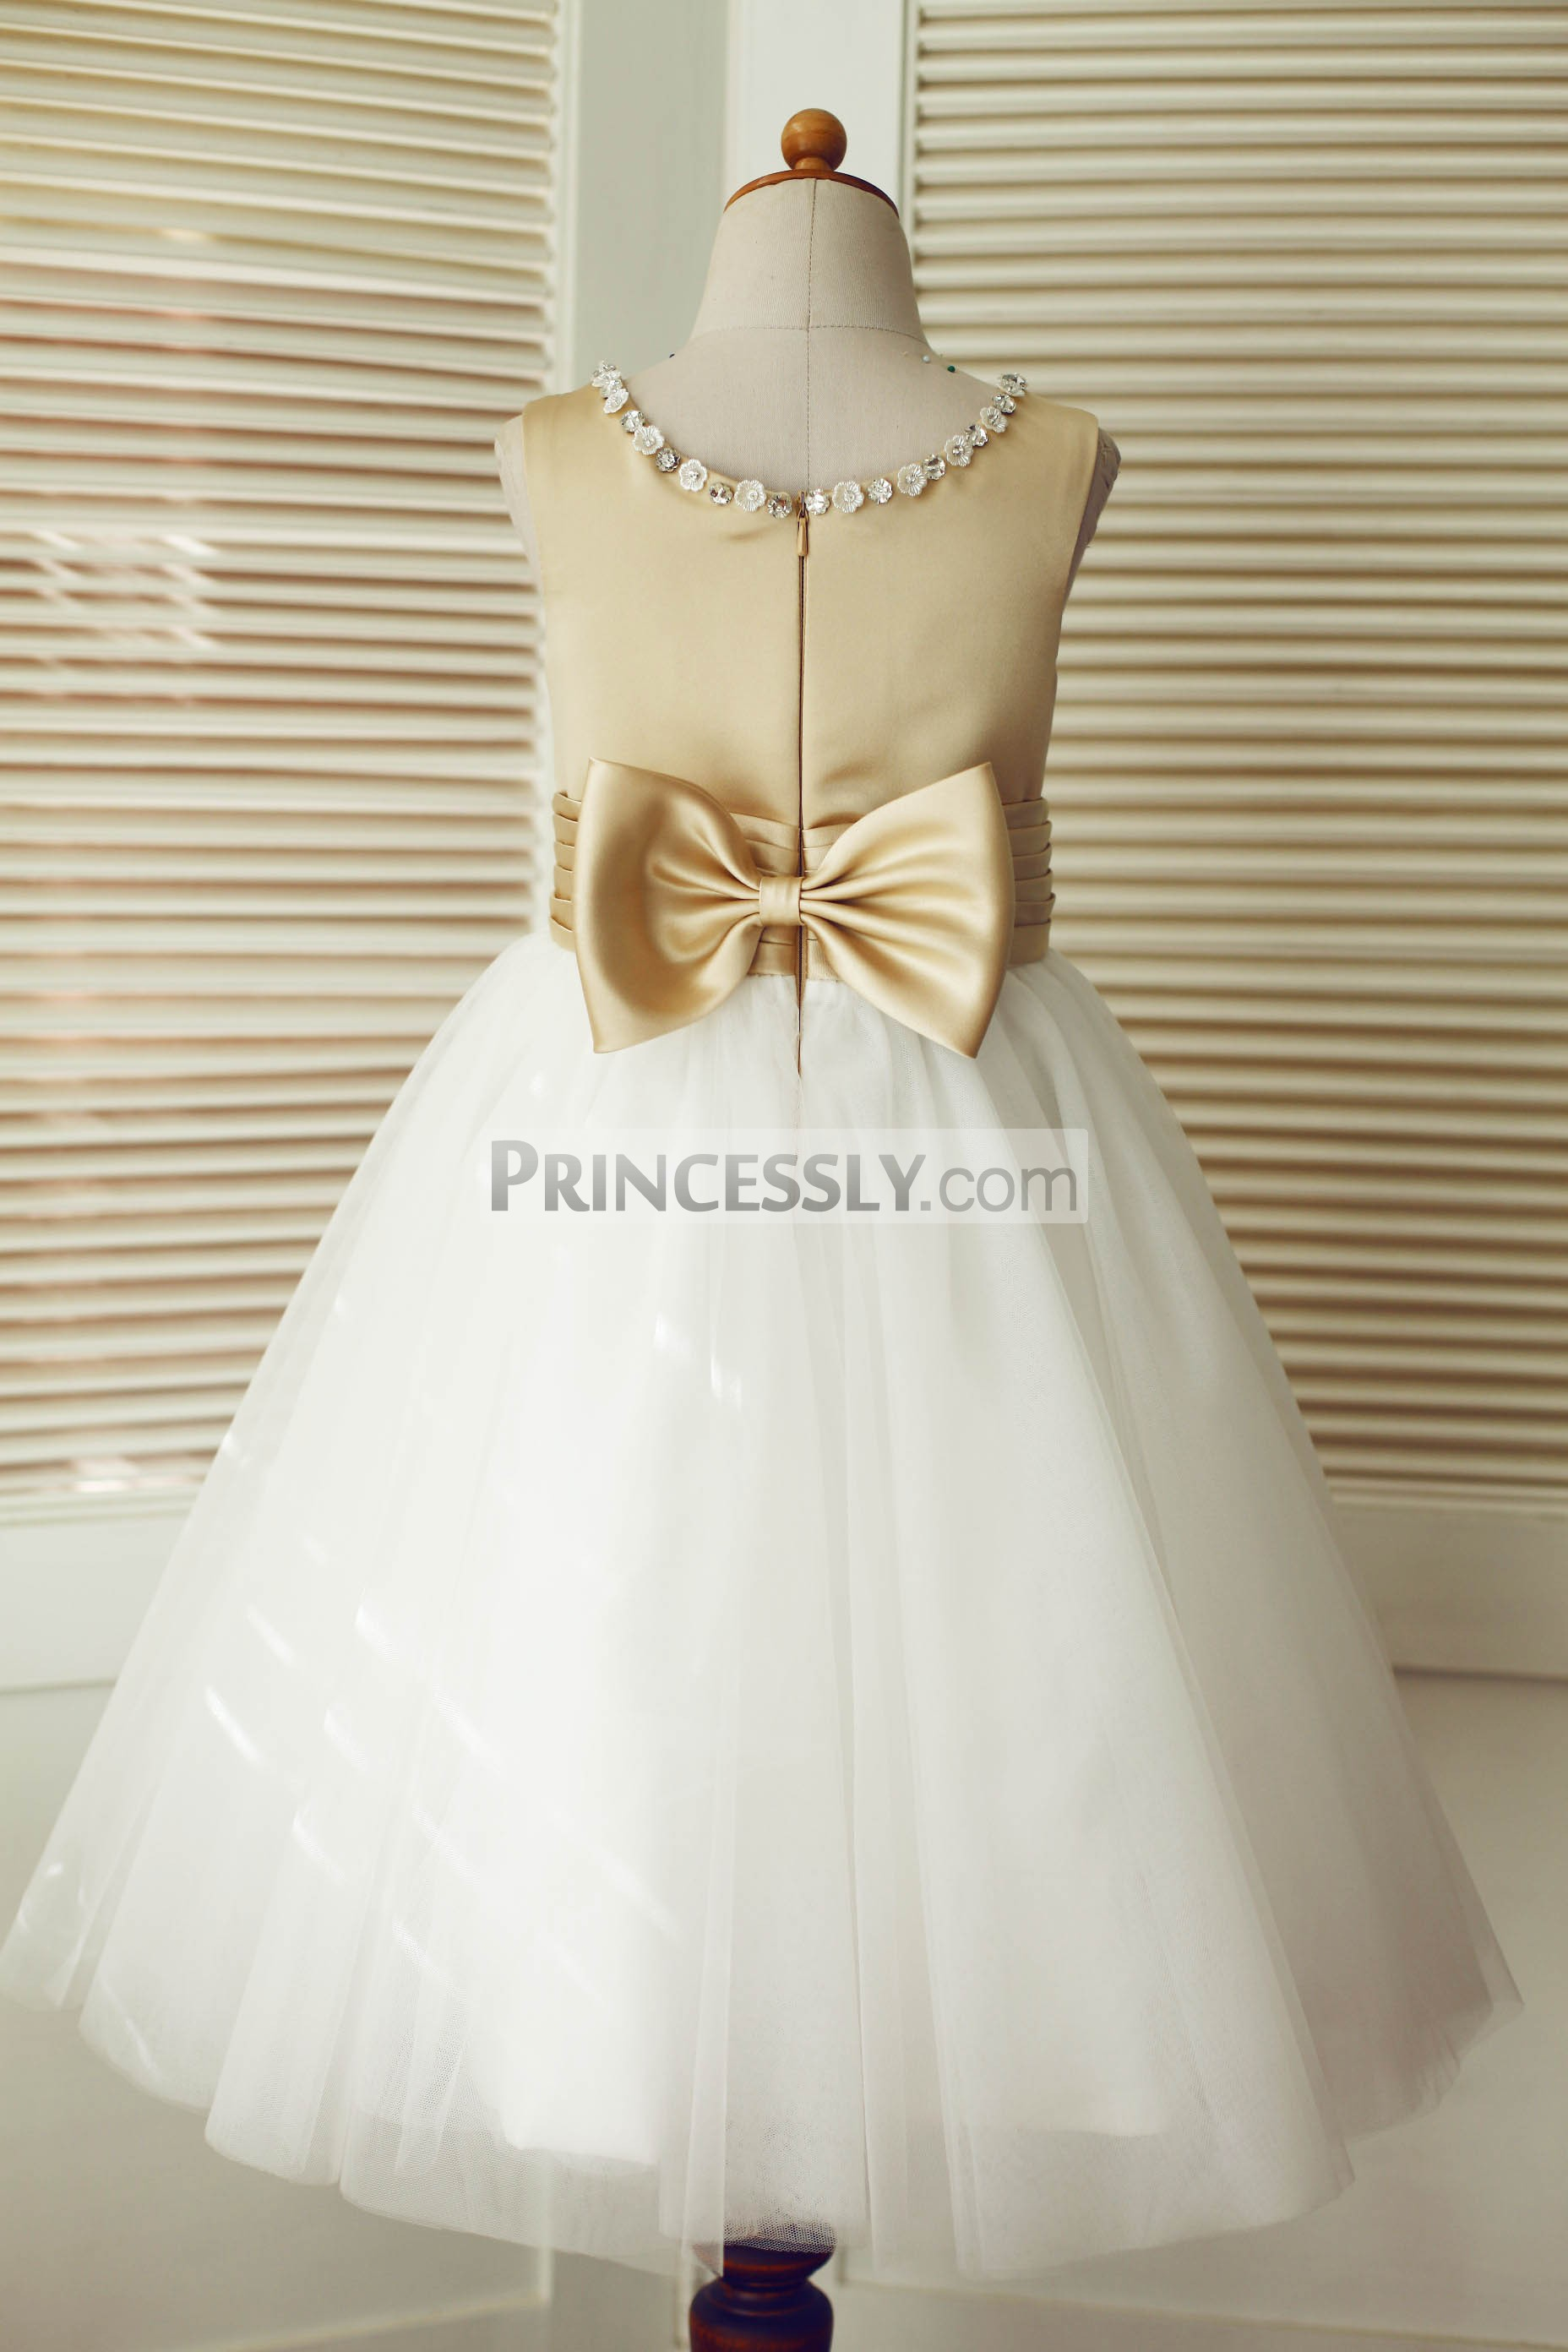 Champagne satin ivory tulle wedding baby girl dress